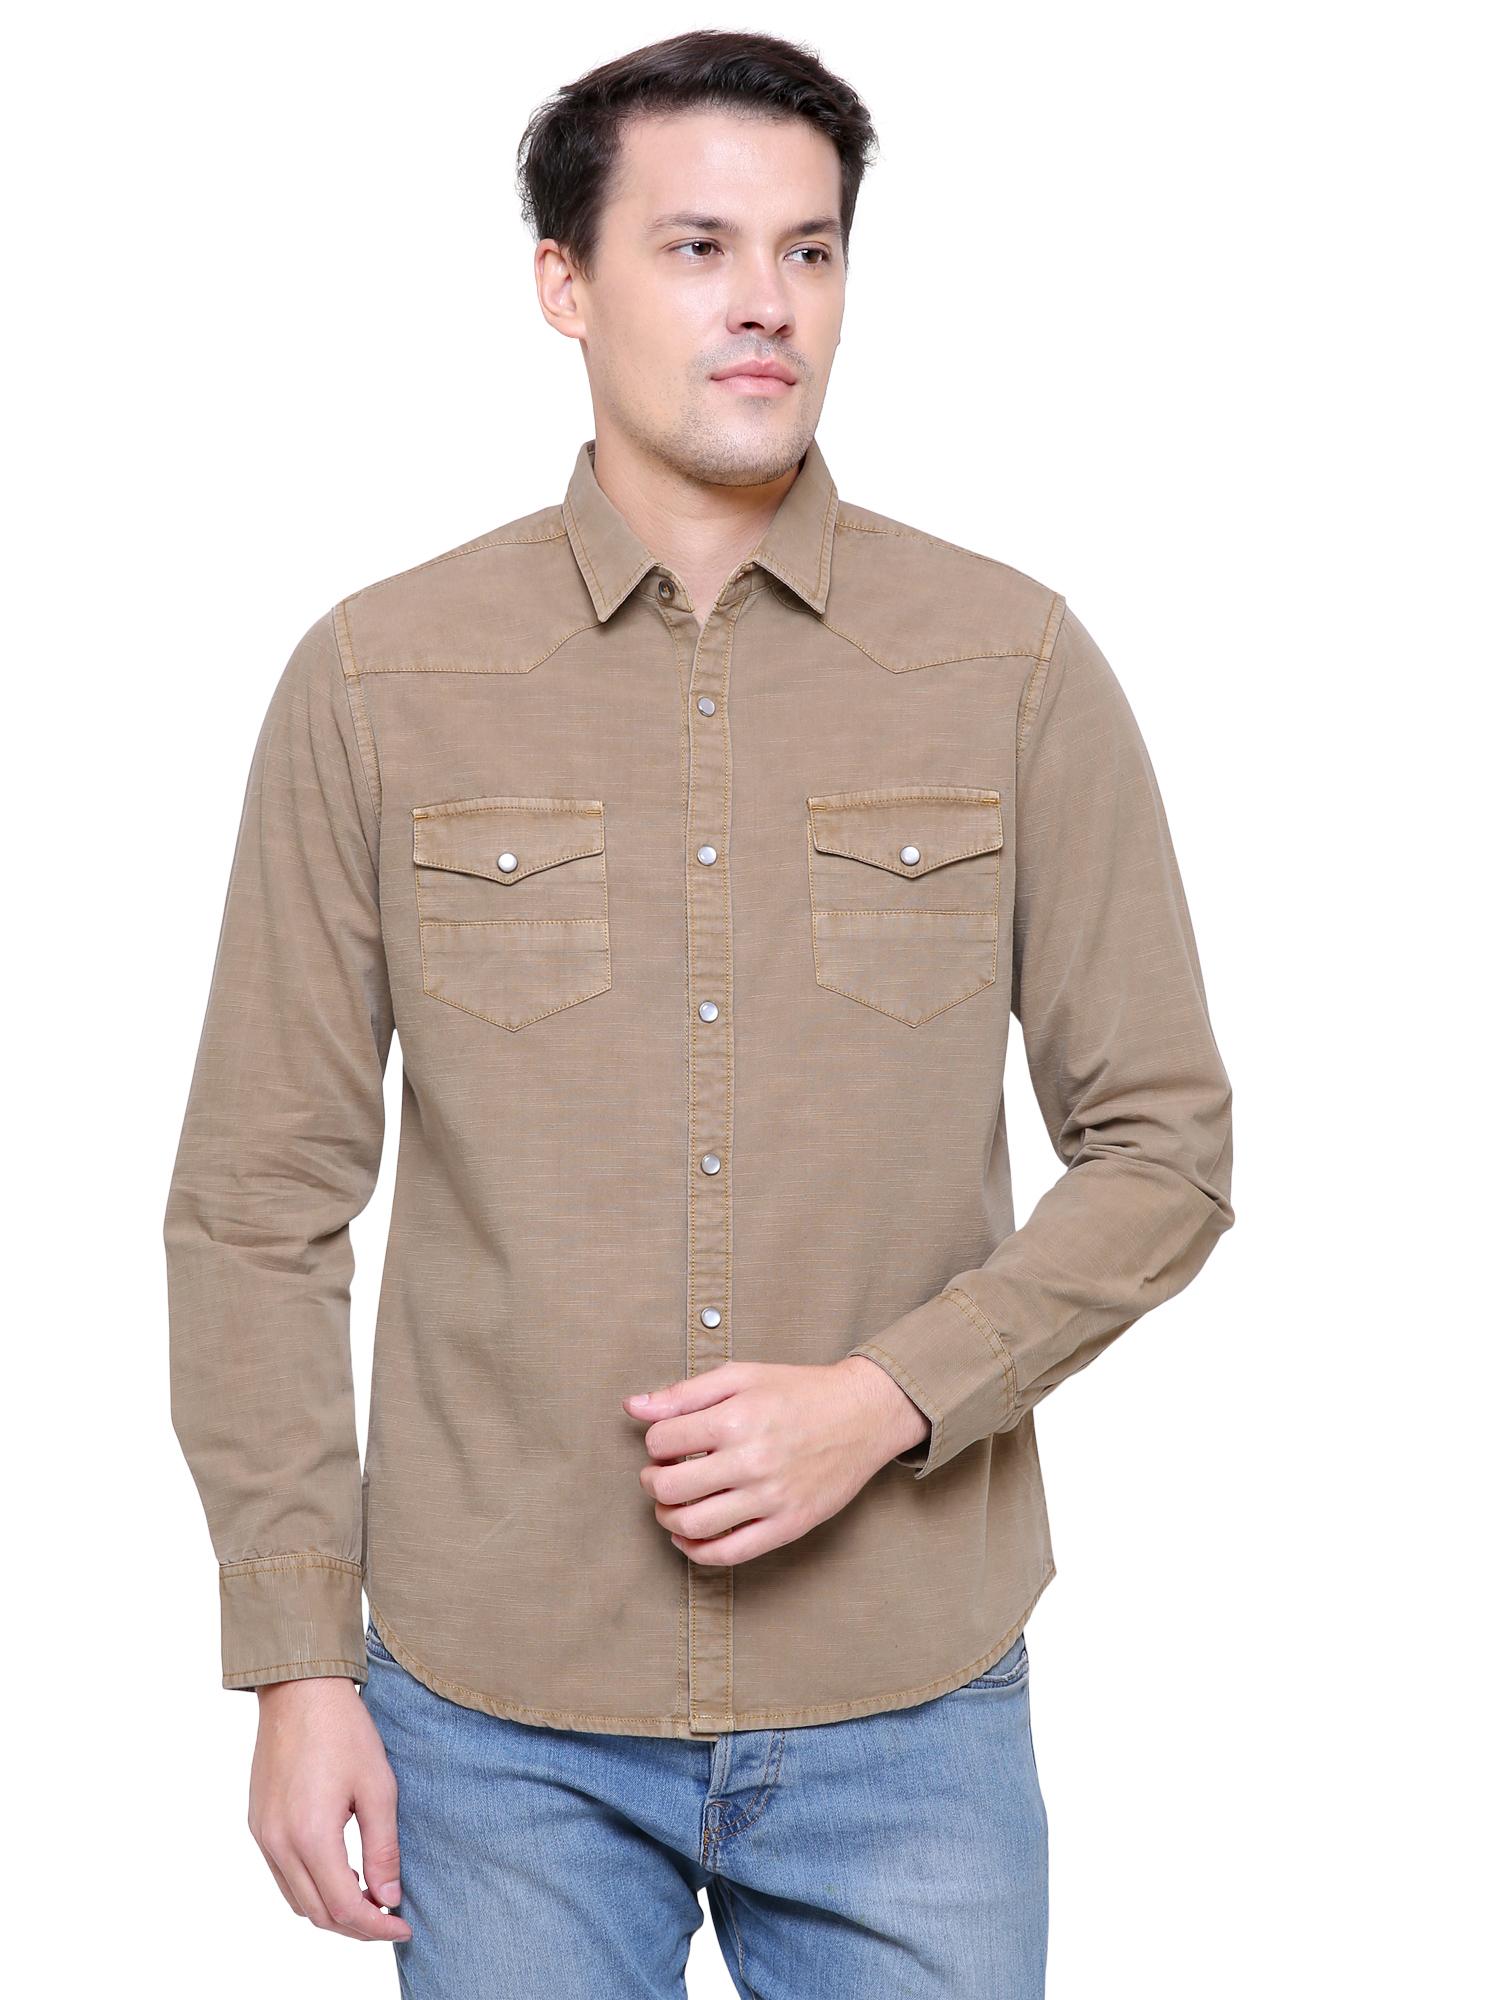 Southbay | Southbay Men's Beige Casual Denim Shirt- SBCLFS985BE